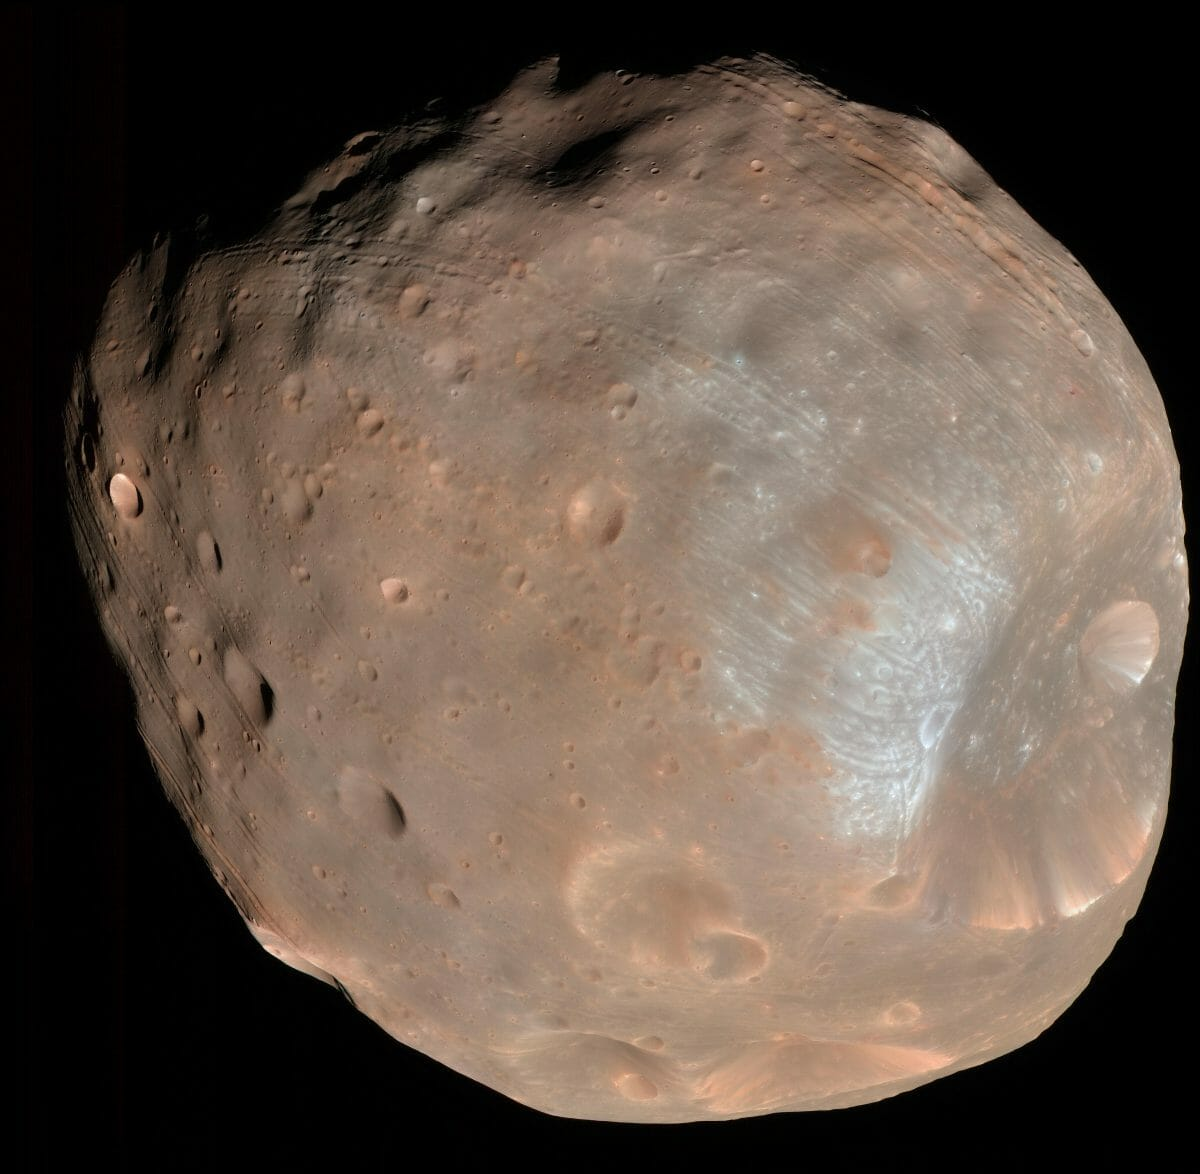 NASAの「マーズ・リコネッサンス・オービター(MRO)」が撮影したフォボス(Credit: NASA/JPL-Caltech/University of Arizona)